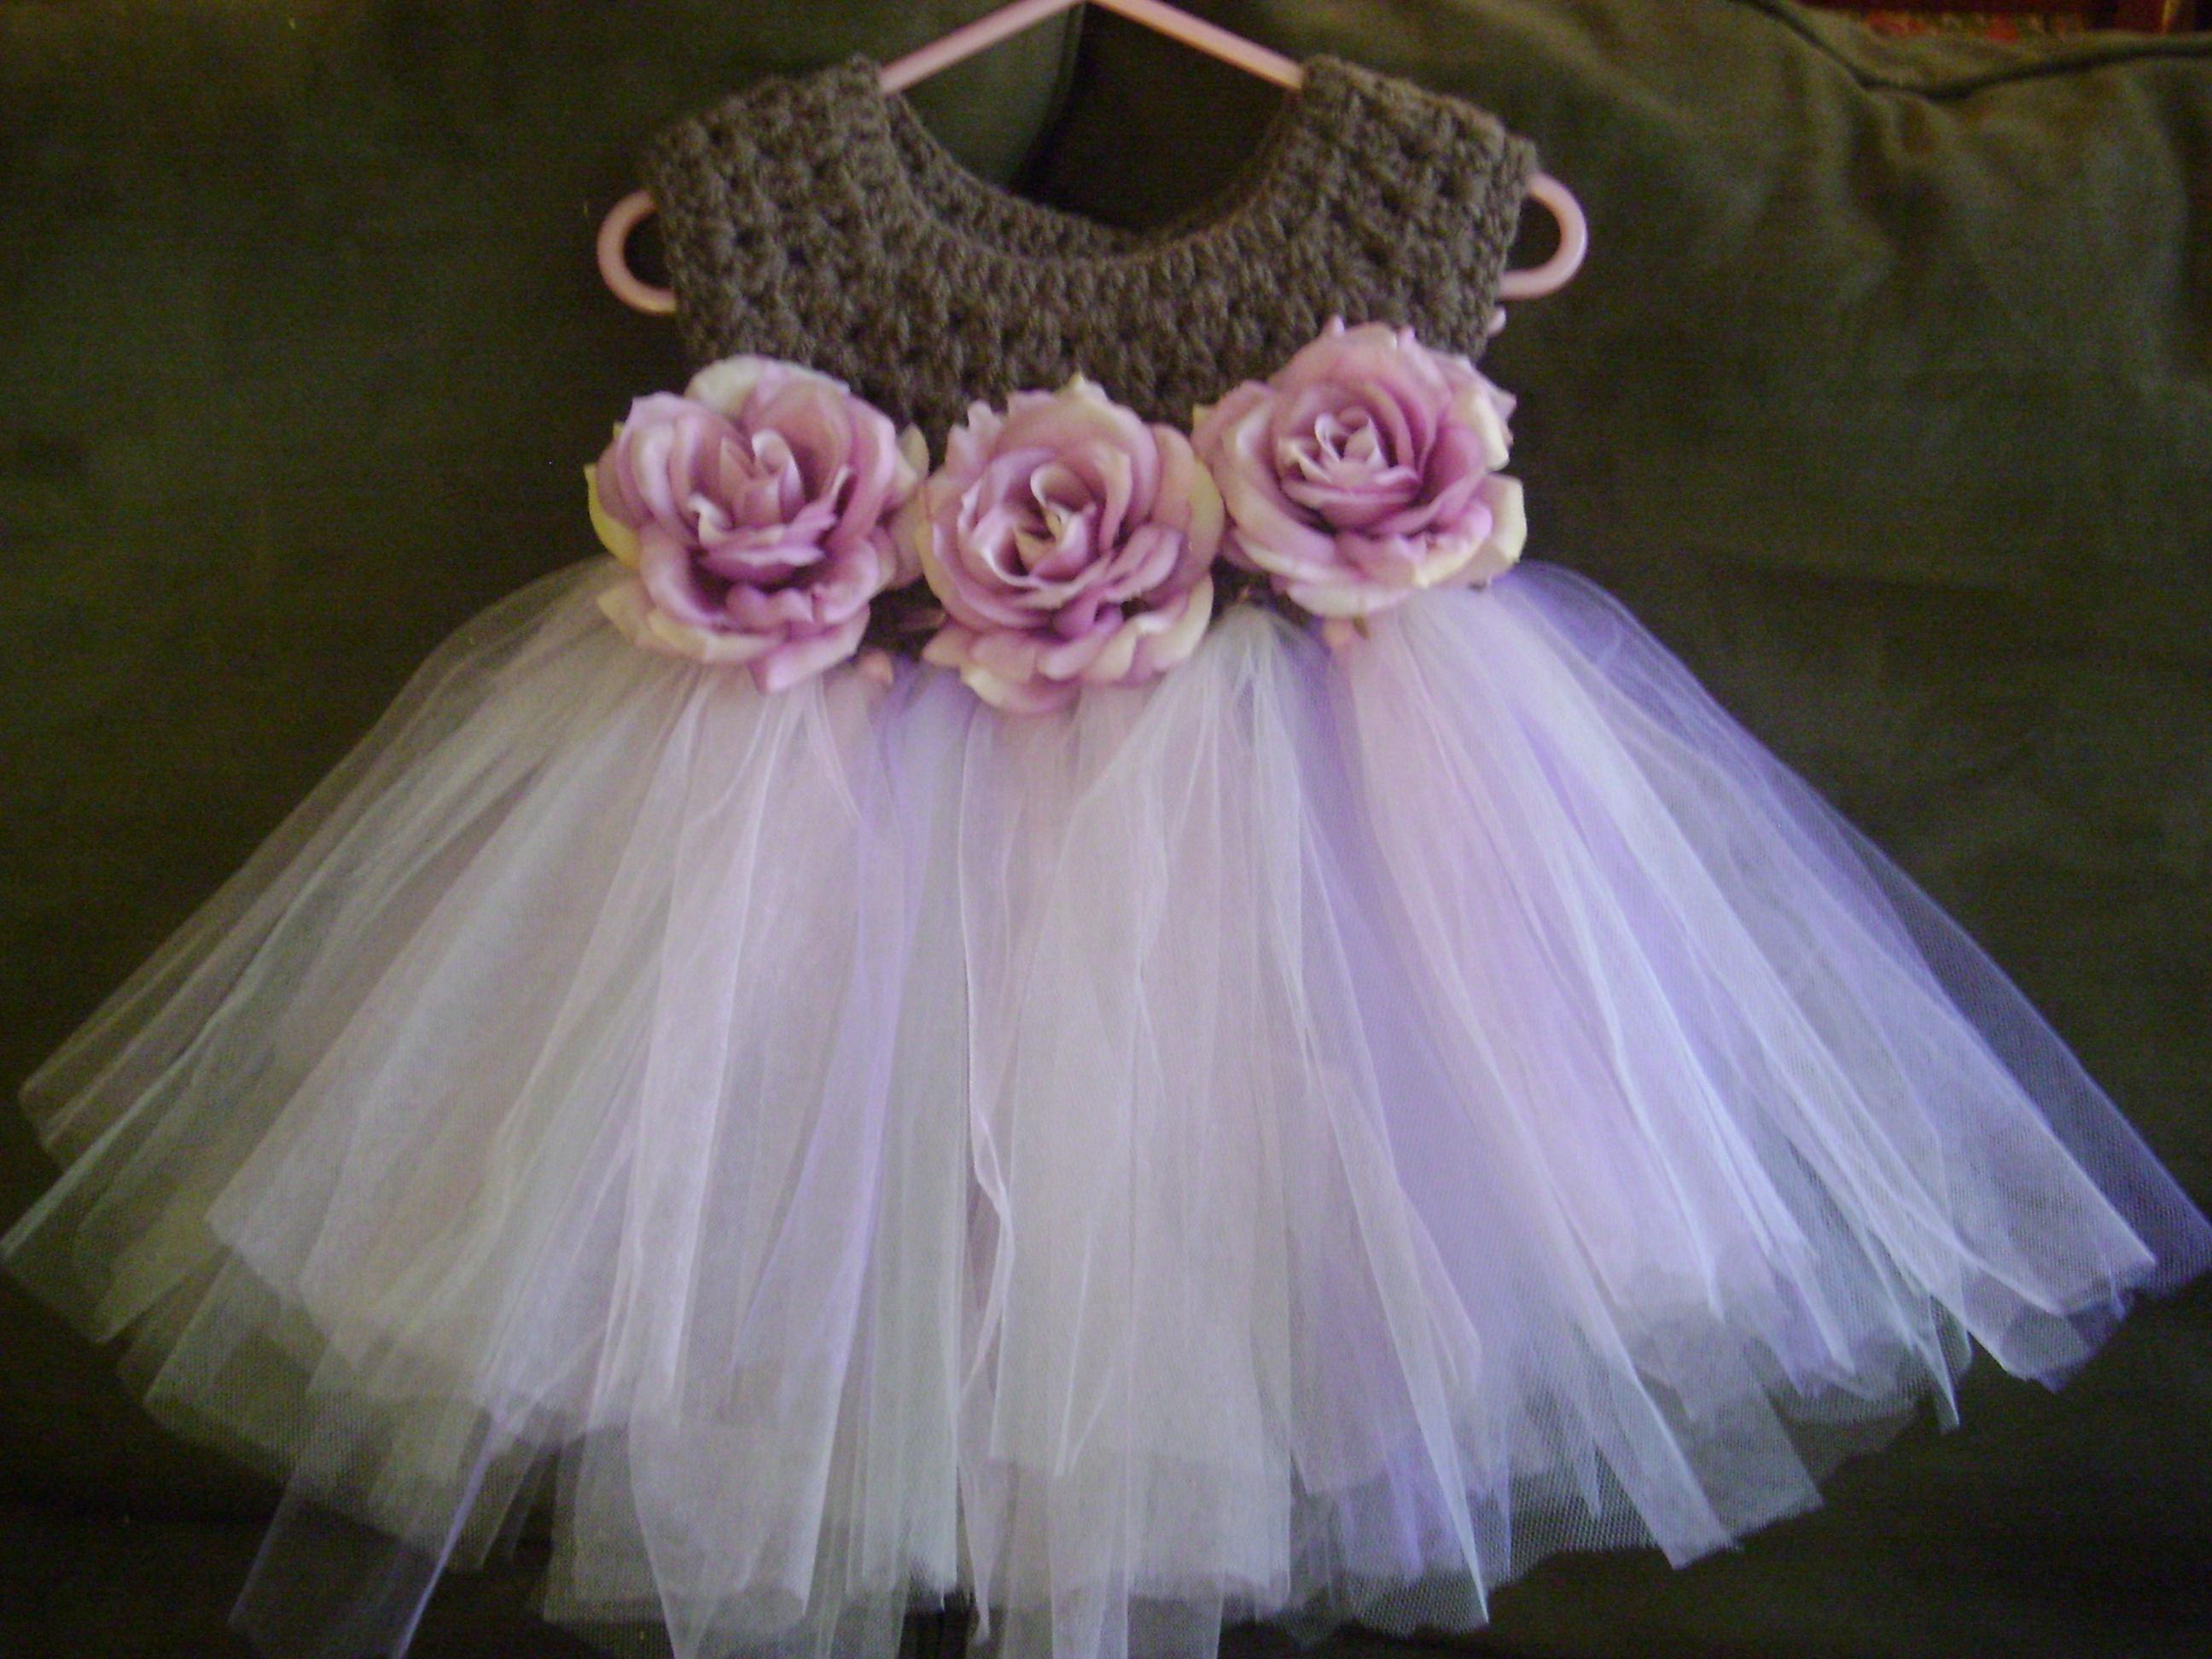 Crochet top Tutu dress ? Sewing Projects BurdaStyle.com